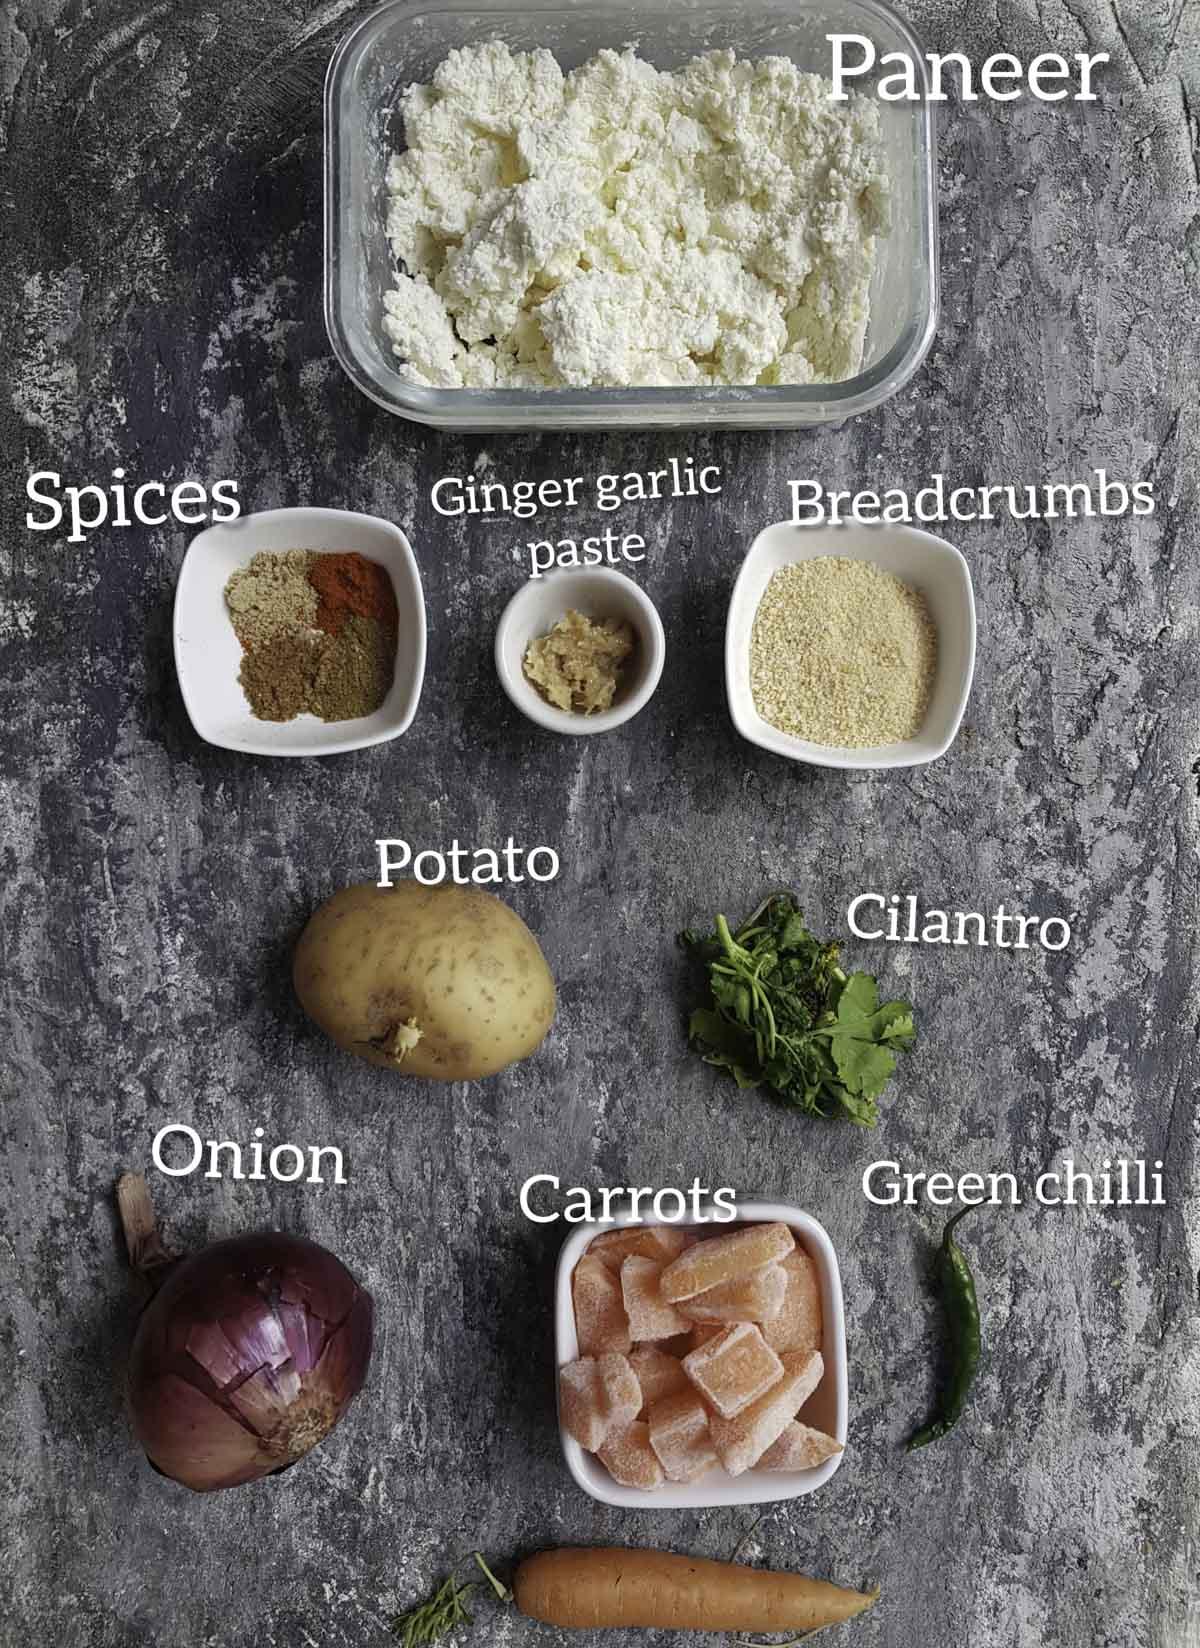 ingredients for making paneer cutlet , paneer, veggies,spices, ginger garlic paste